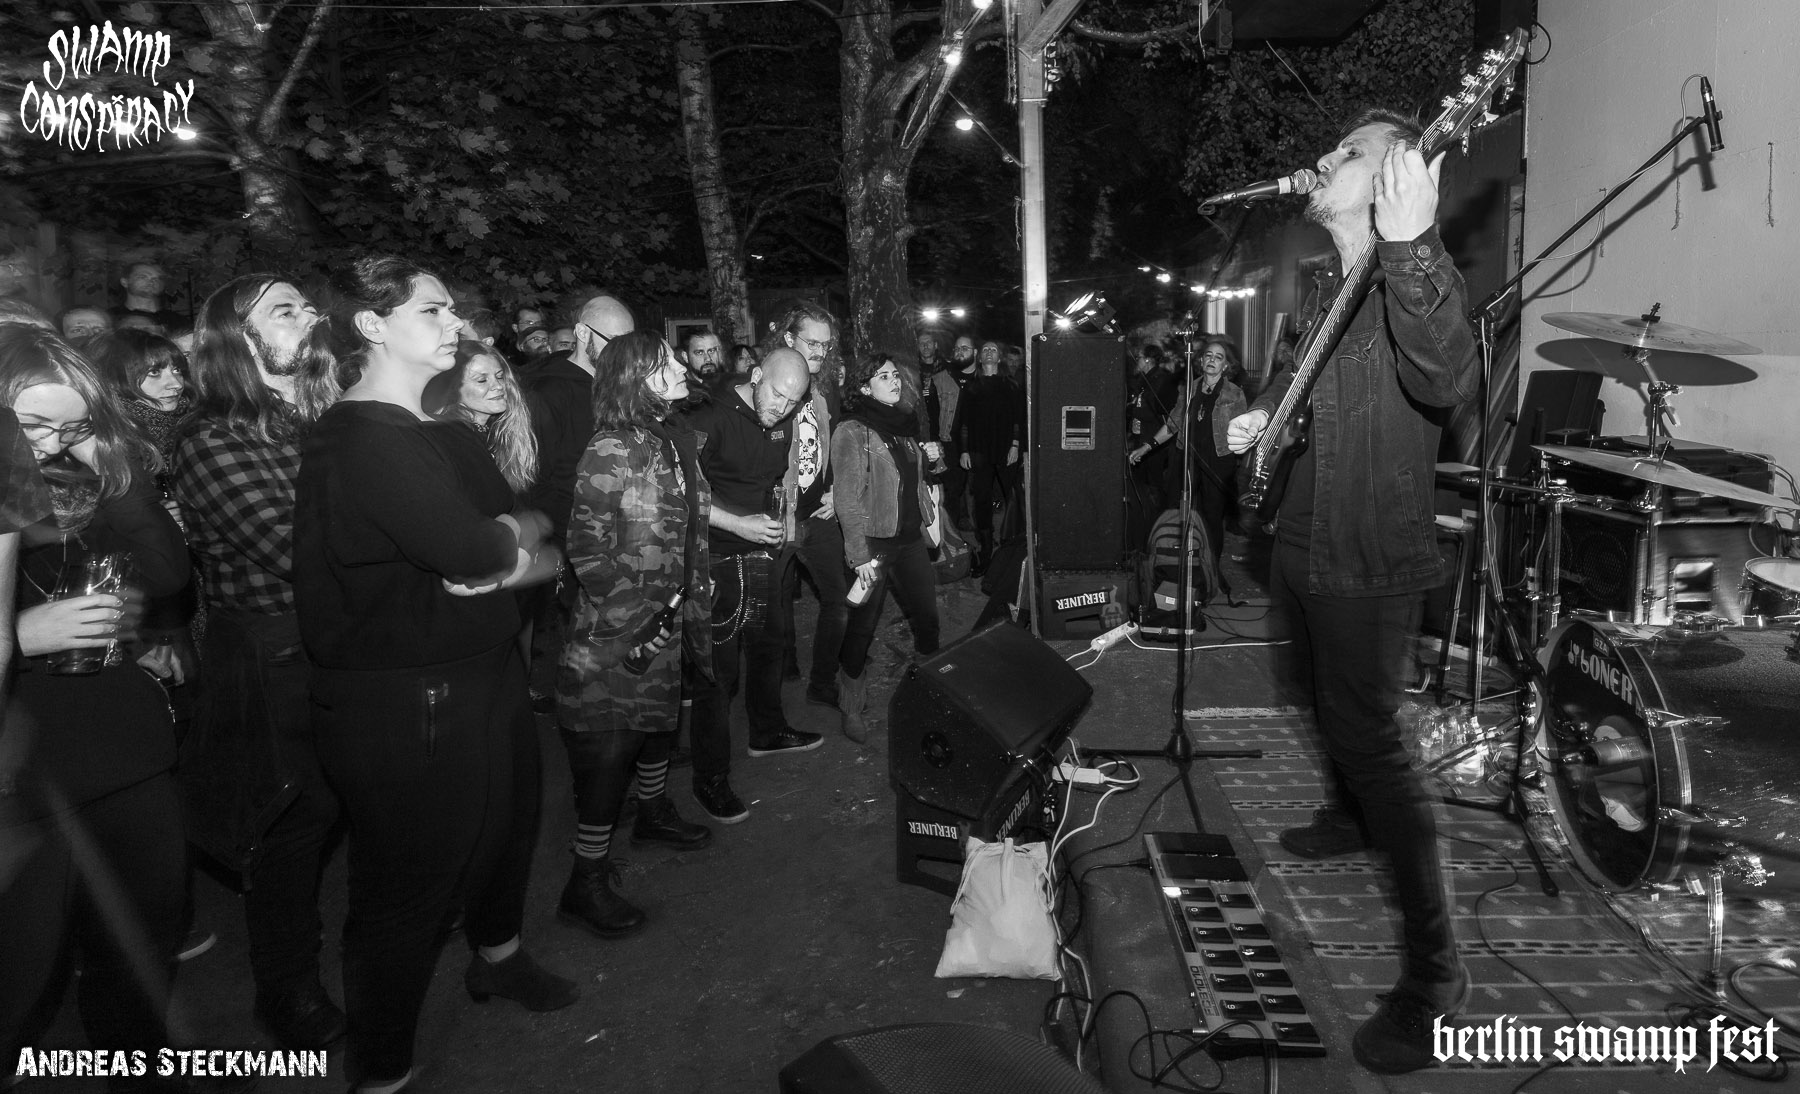 Purpura_Berlin_Swamp_Fest_2019_1